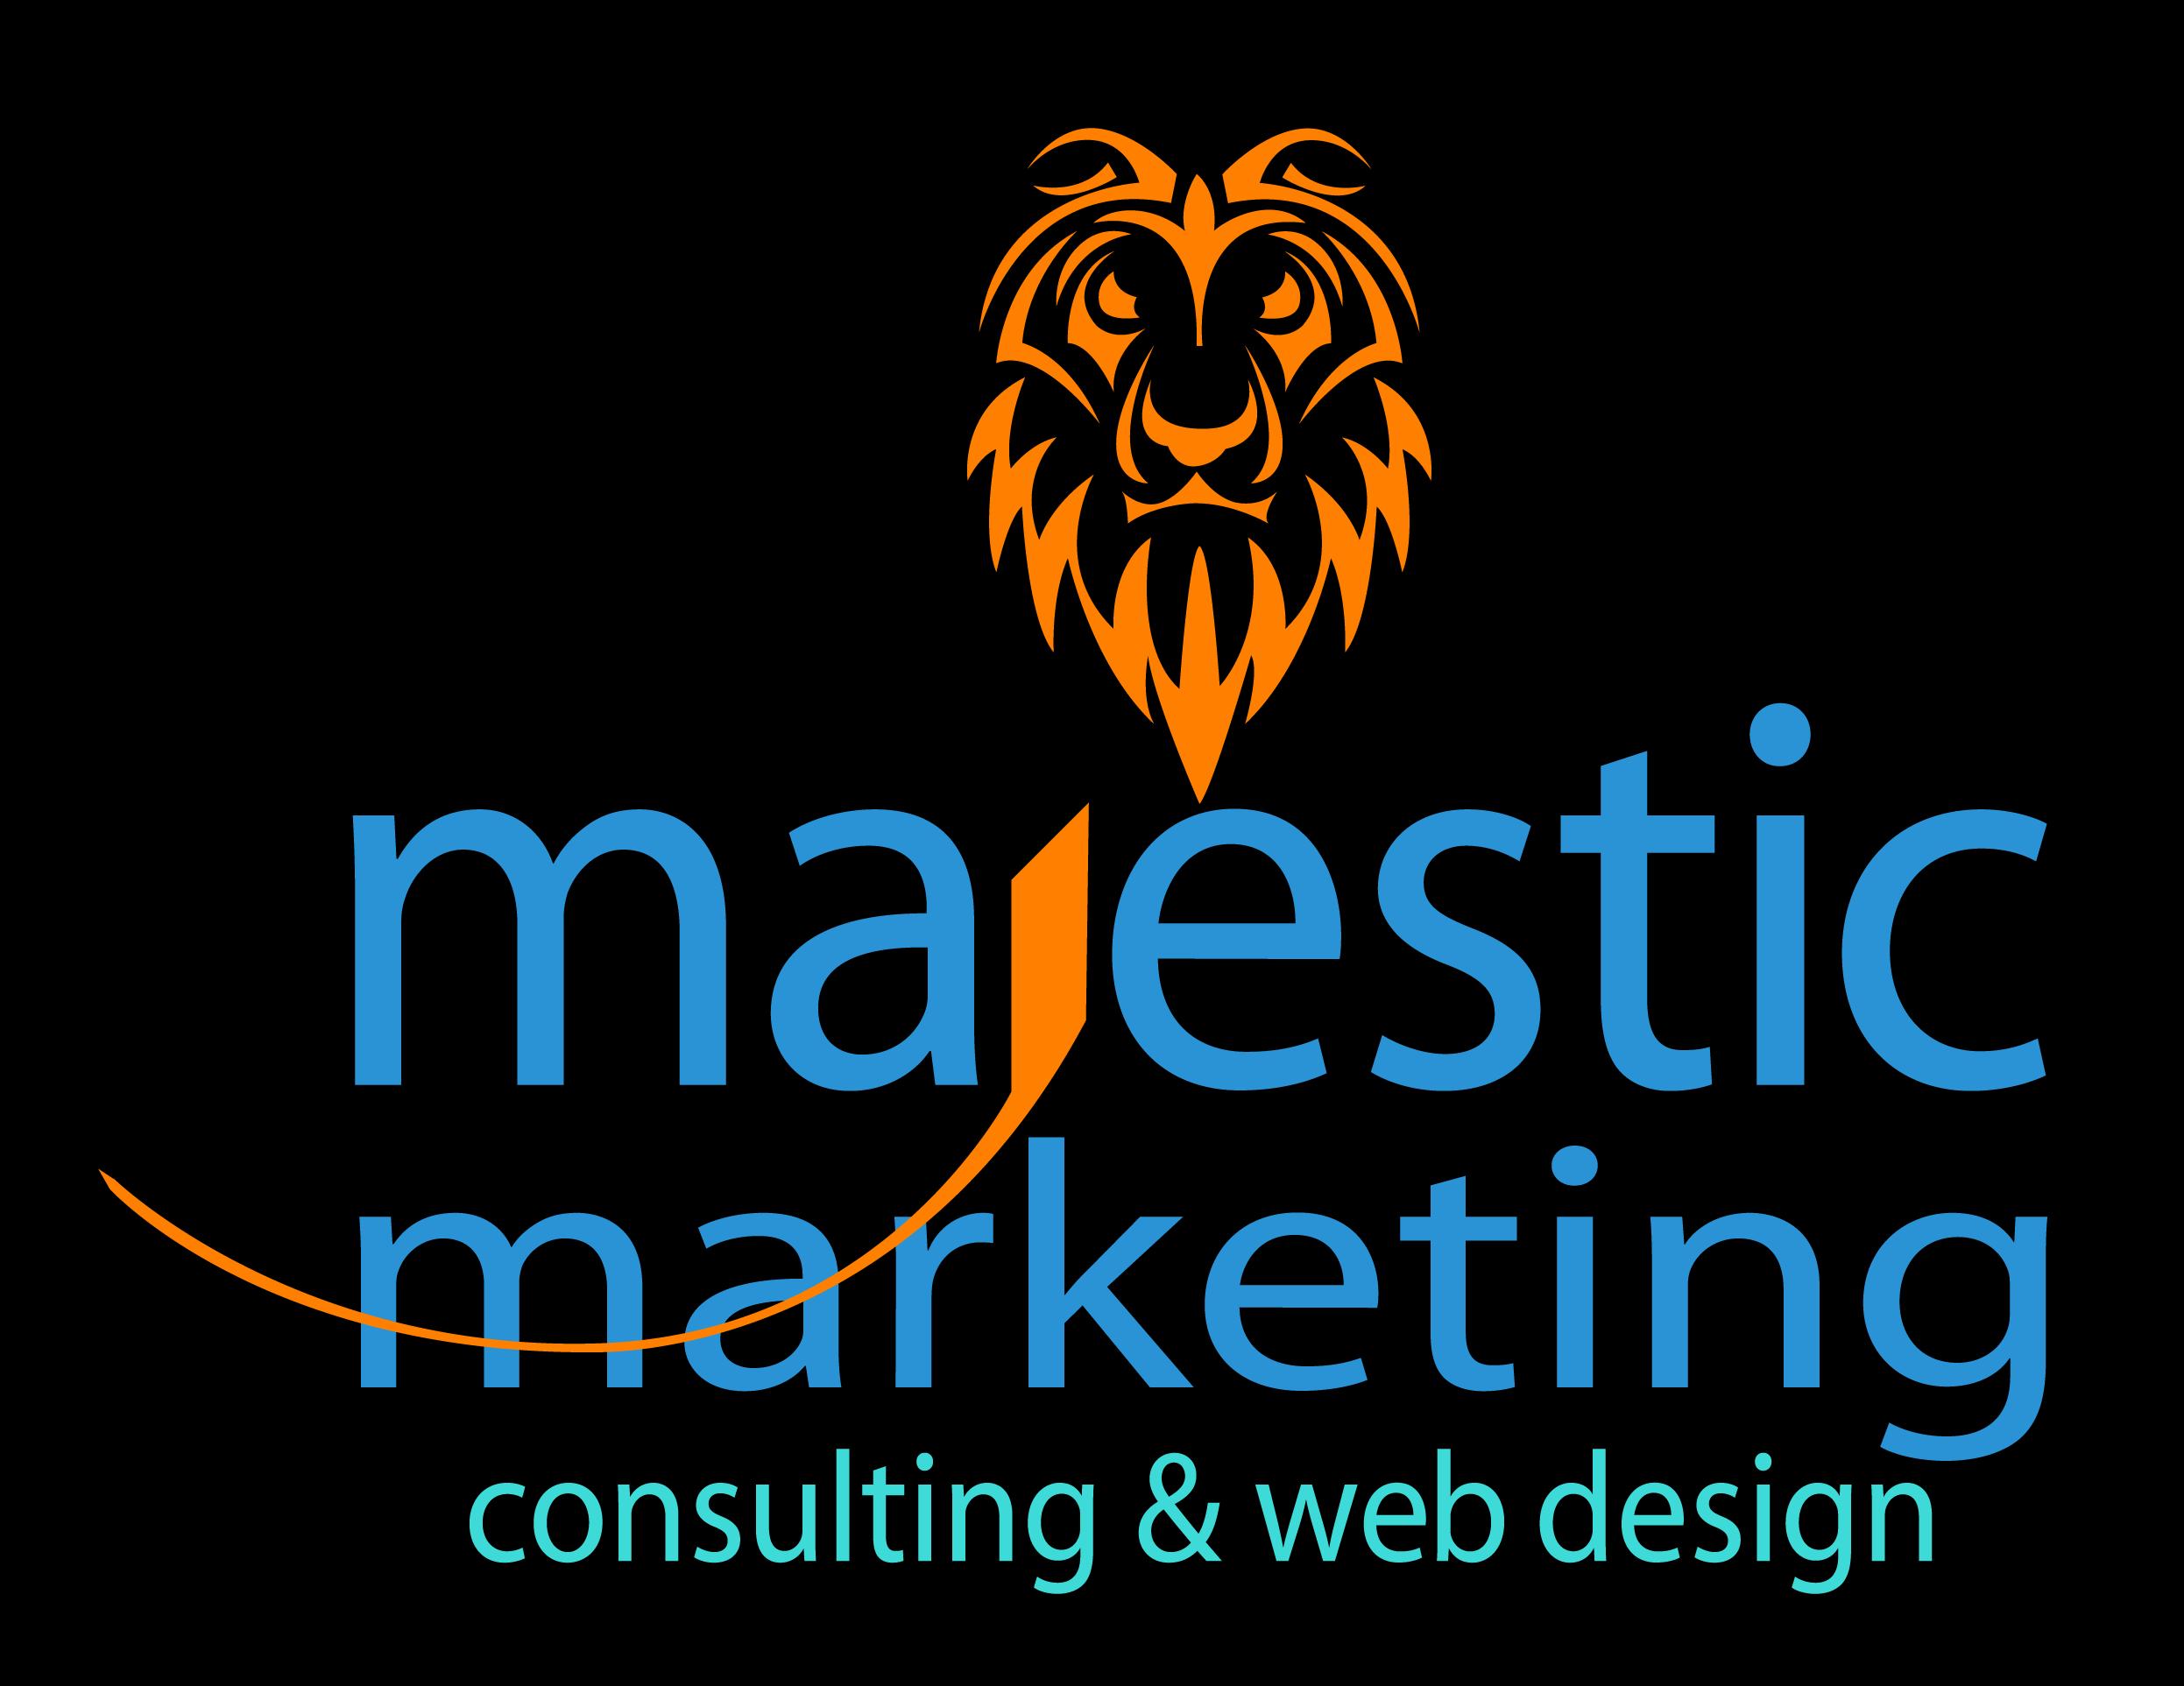 Majestic Marketing